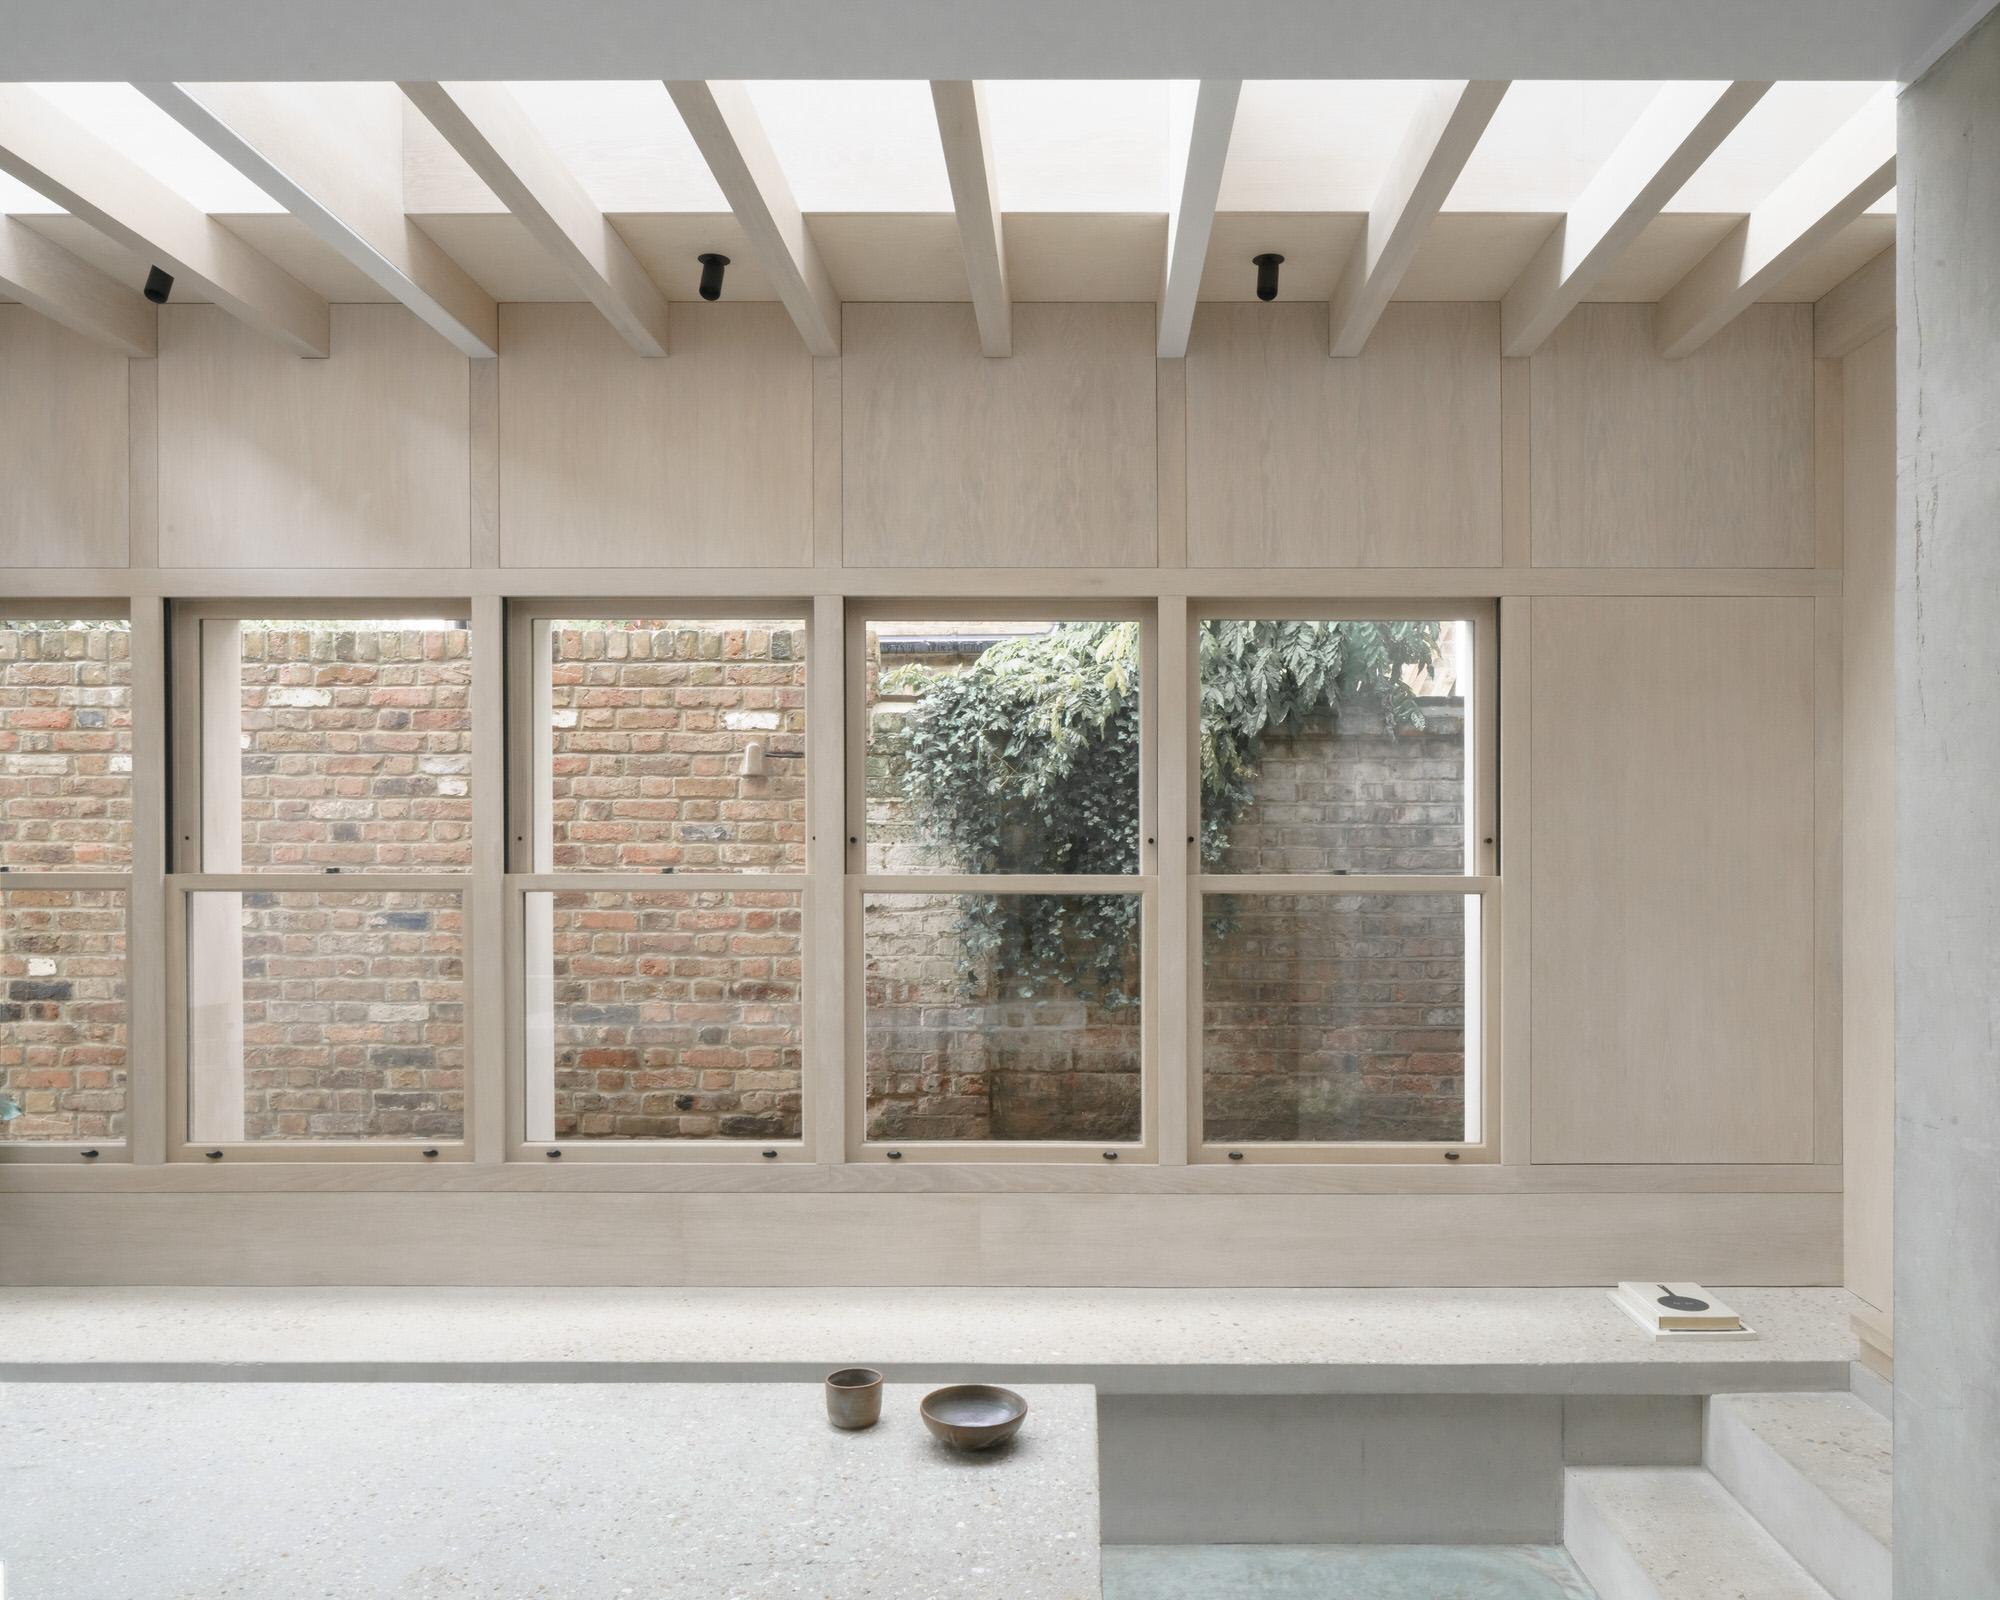 Dgn Studio Concrete Plinth House East London Residential Architecture Photo Nick Dearden Yellowtrace 05